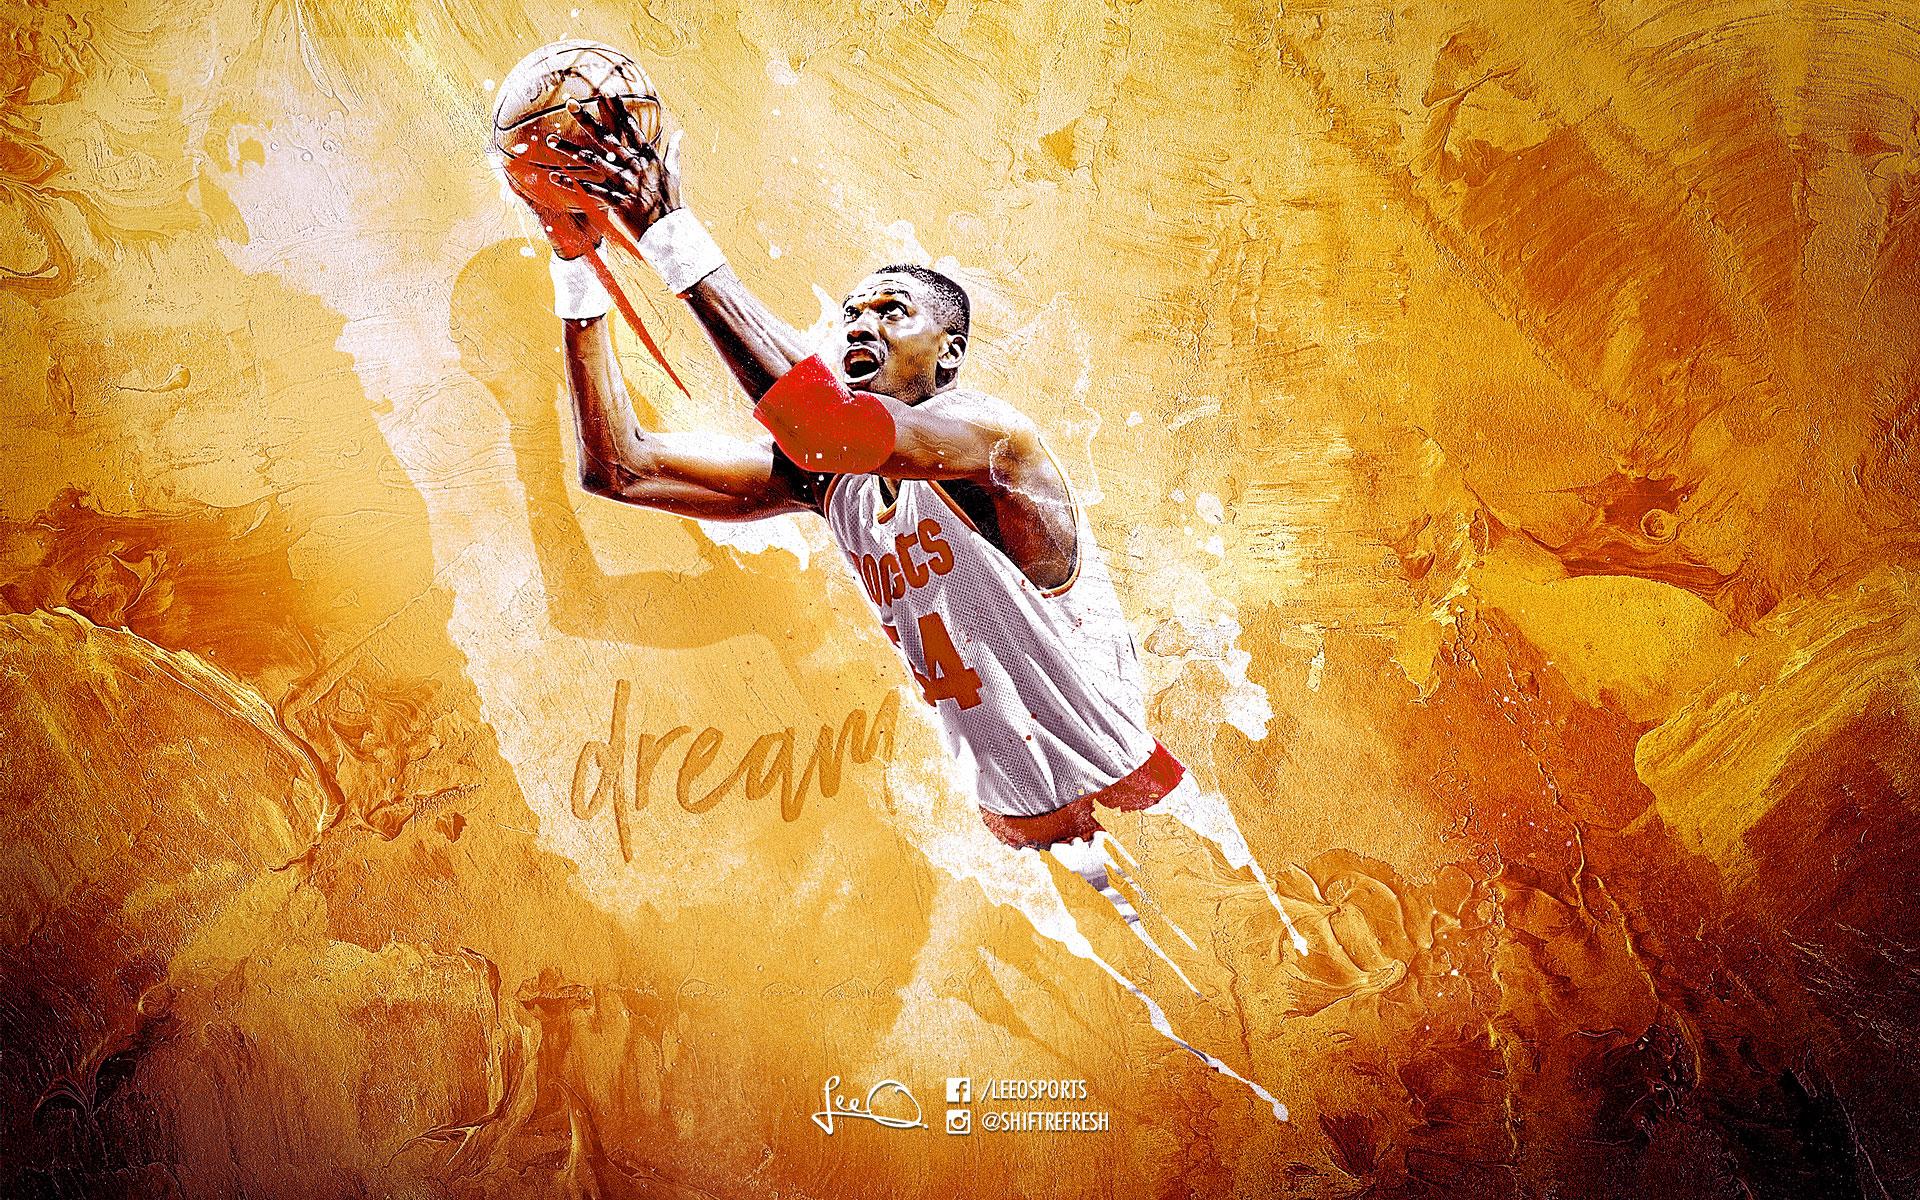 Hakeem Olajuwon Wallpapers | Basketball Wallpapers at